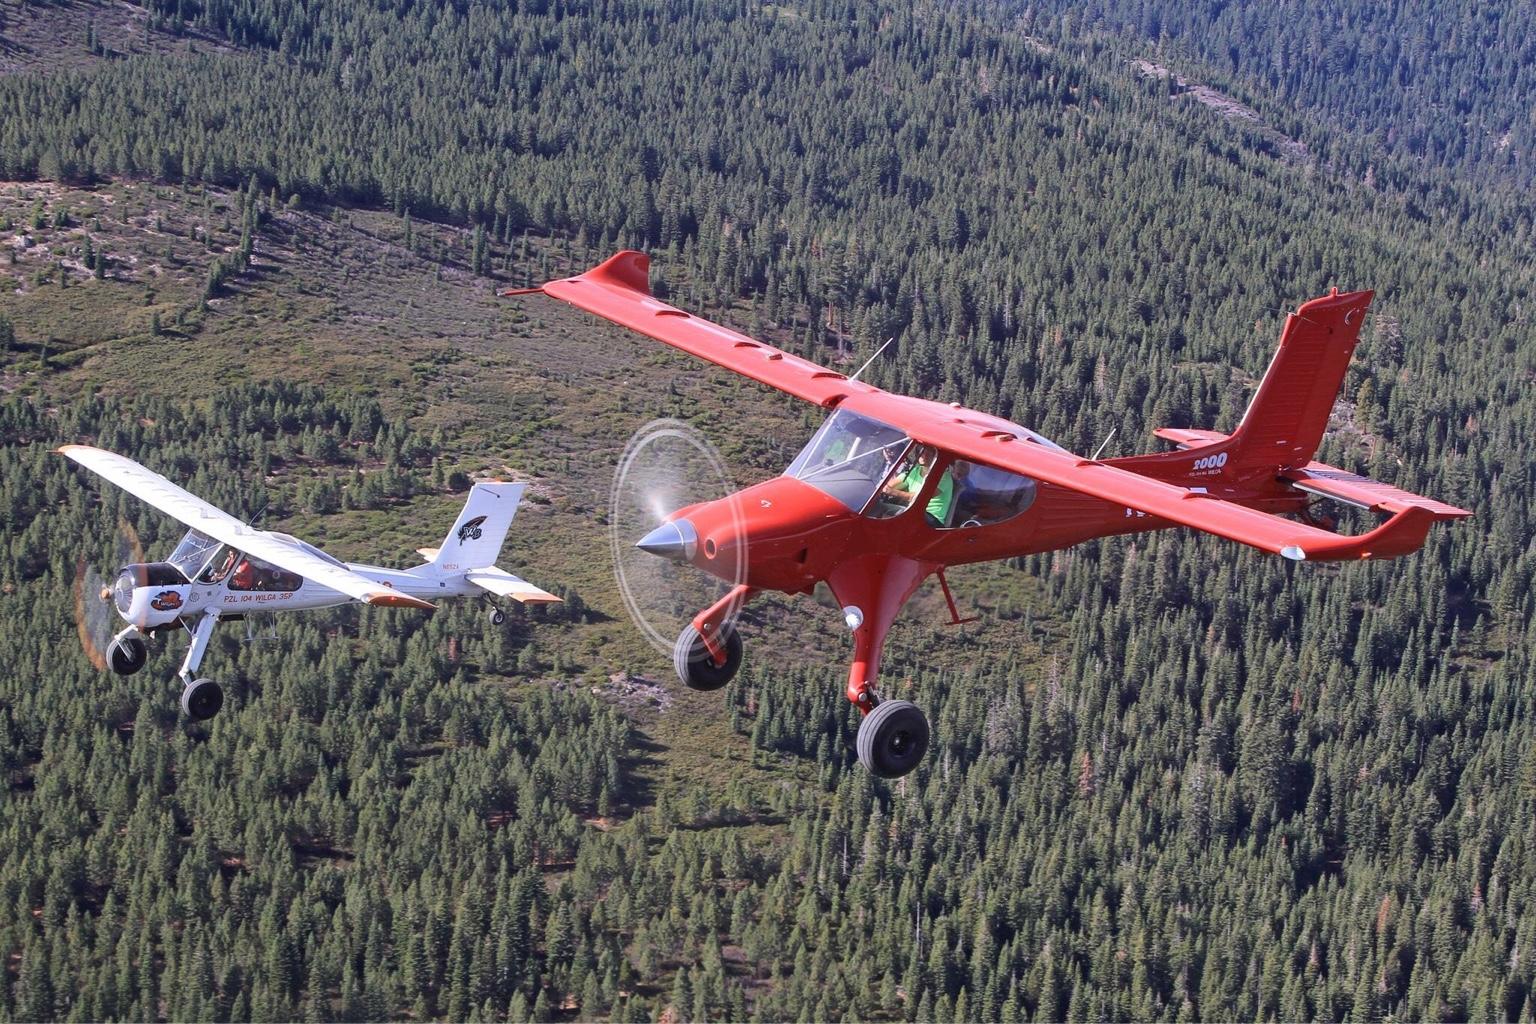 Wilga Beasts girl friend - Backcountry Pilot